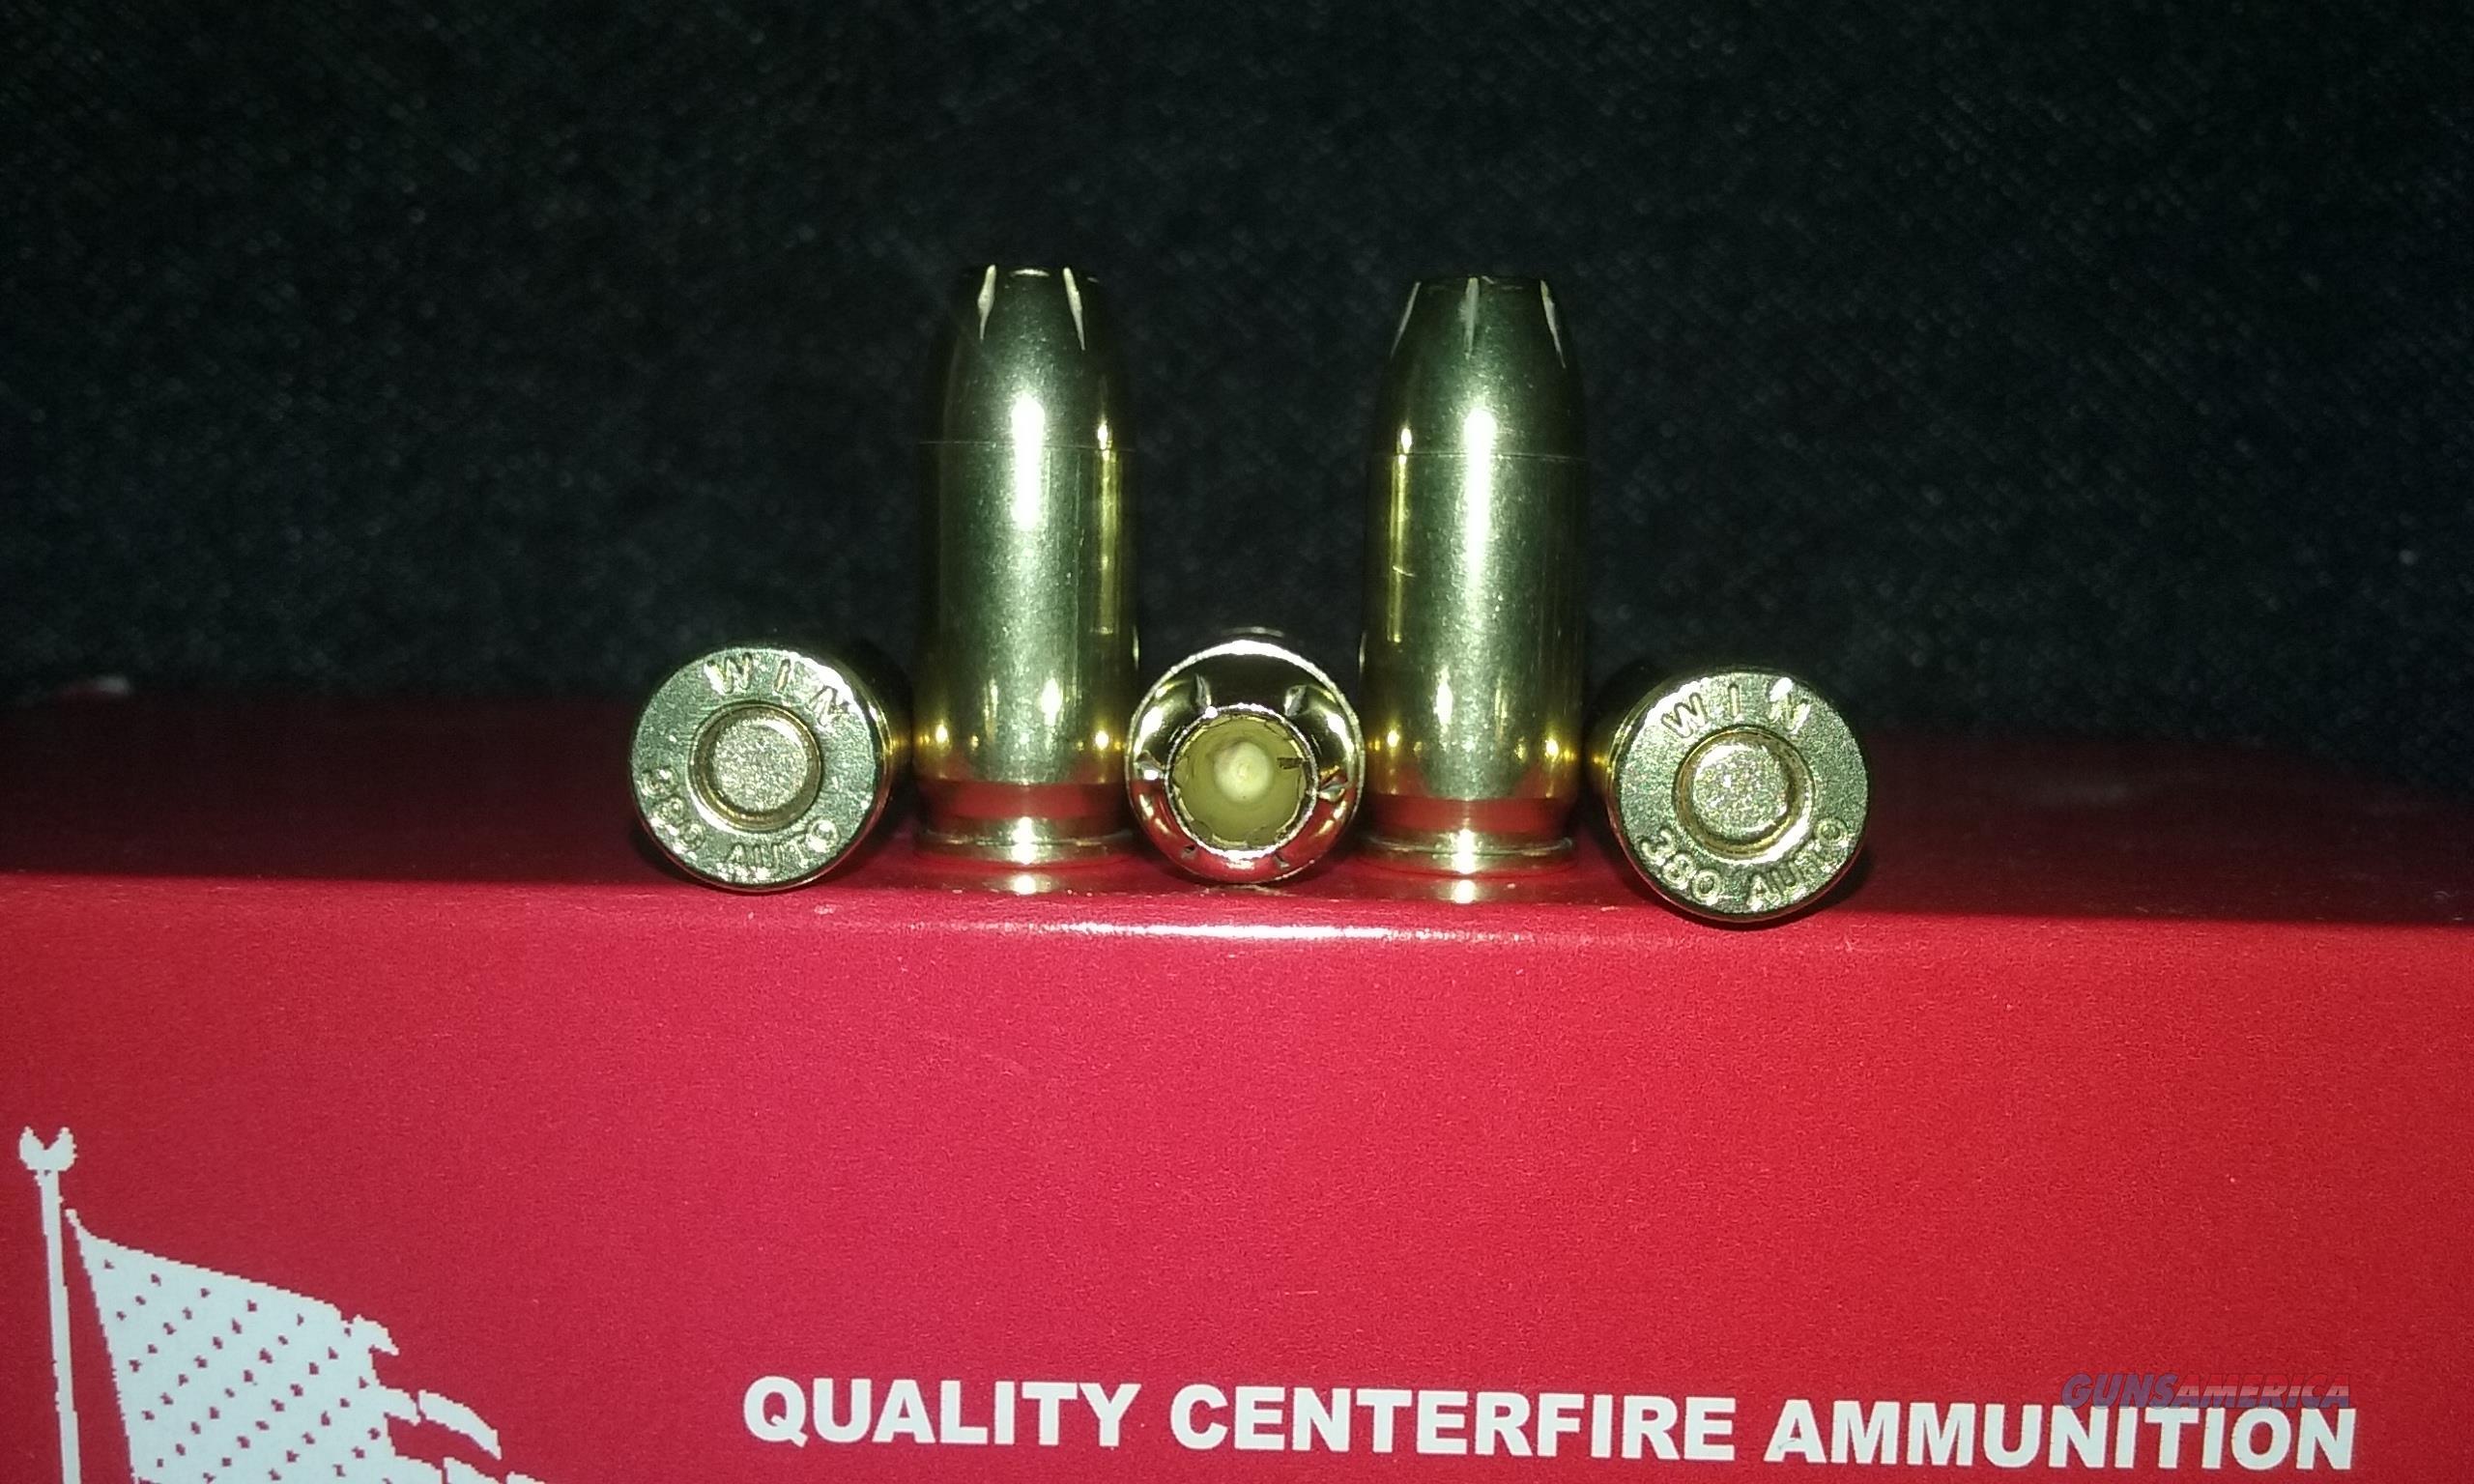 380 Auto Ammo. (380 ACP, 9mm Kurz, 9mm Corto, 9X17 Browning Short)  Non-Guns > Ammunition